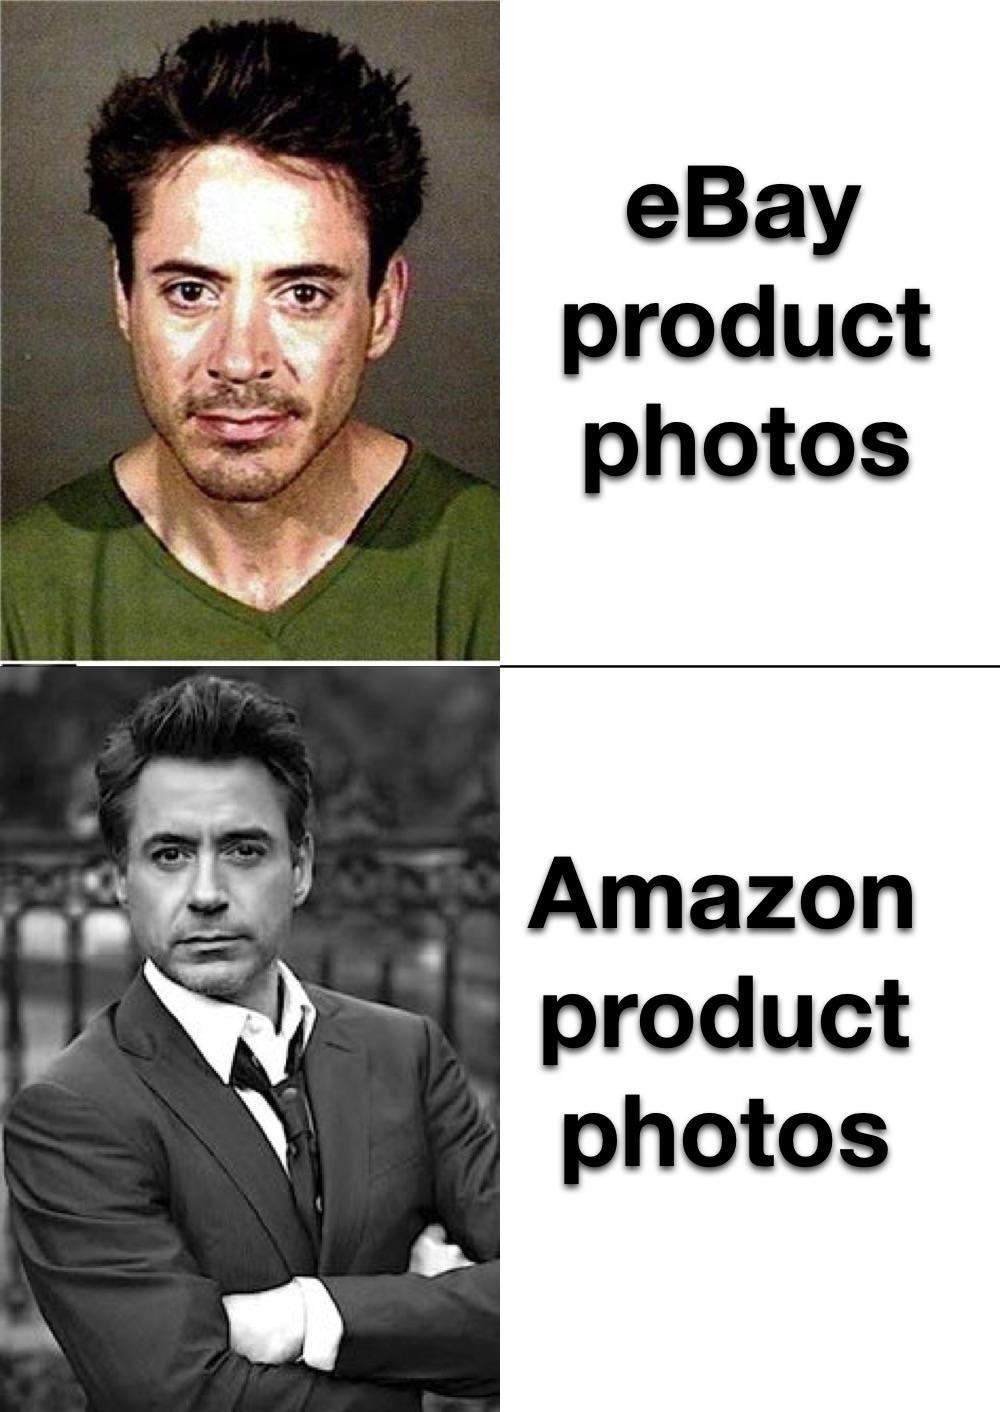 eBay is low effort e-commerce.